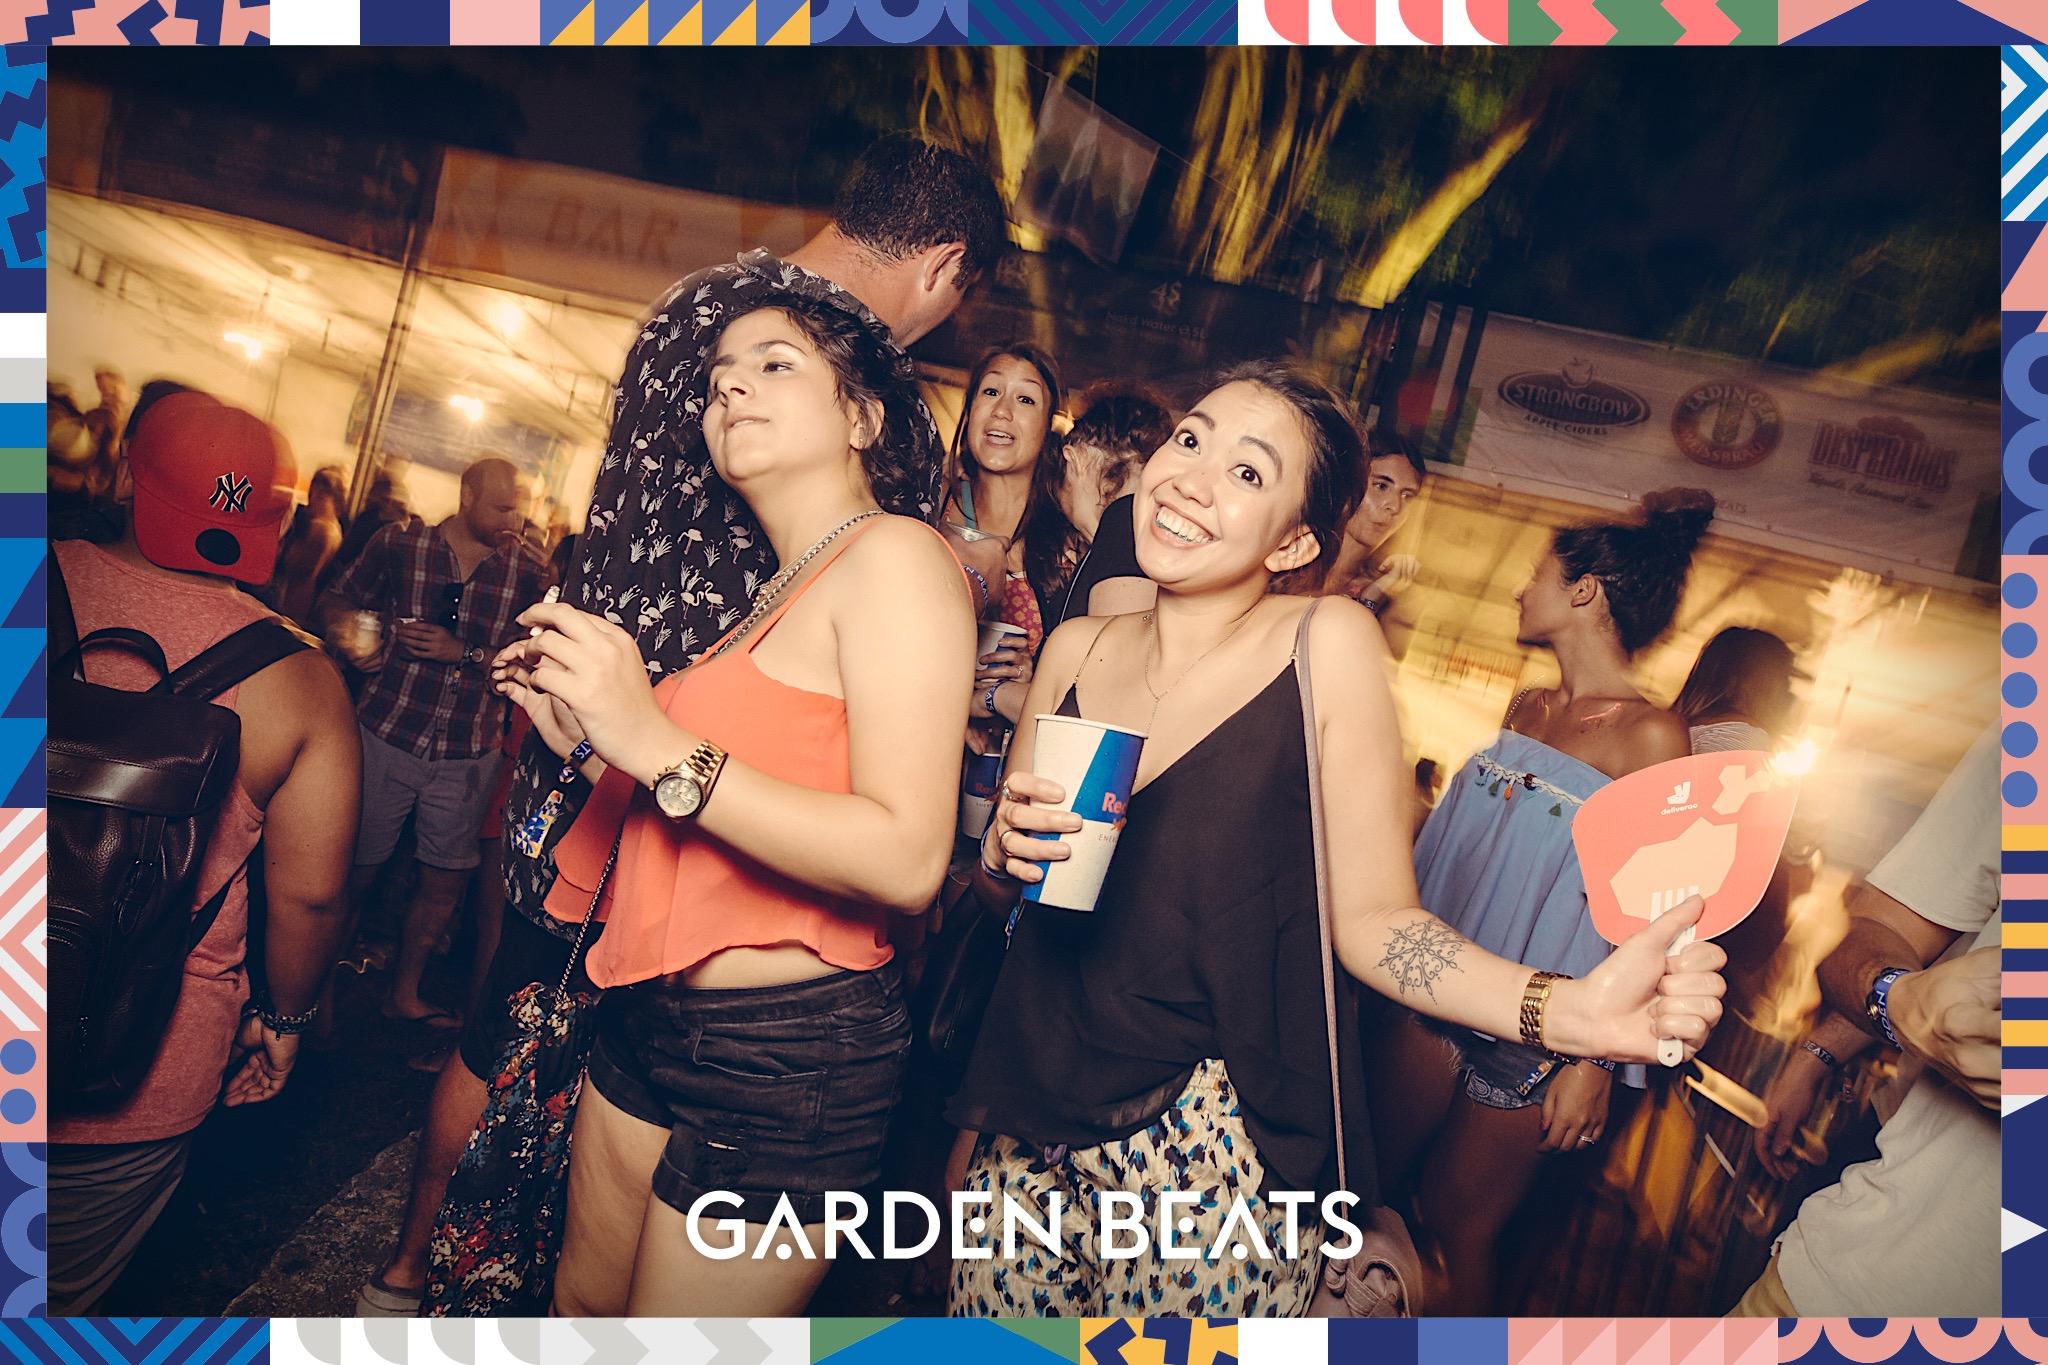 18032017_GardenBeats_Colossal857_WatermarkedGB.jpg